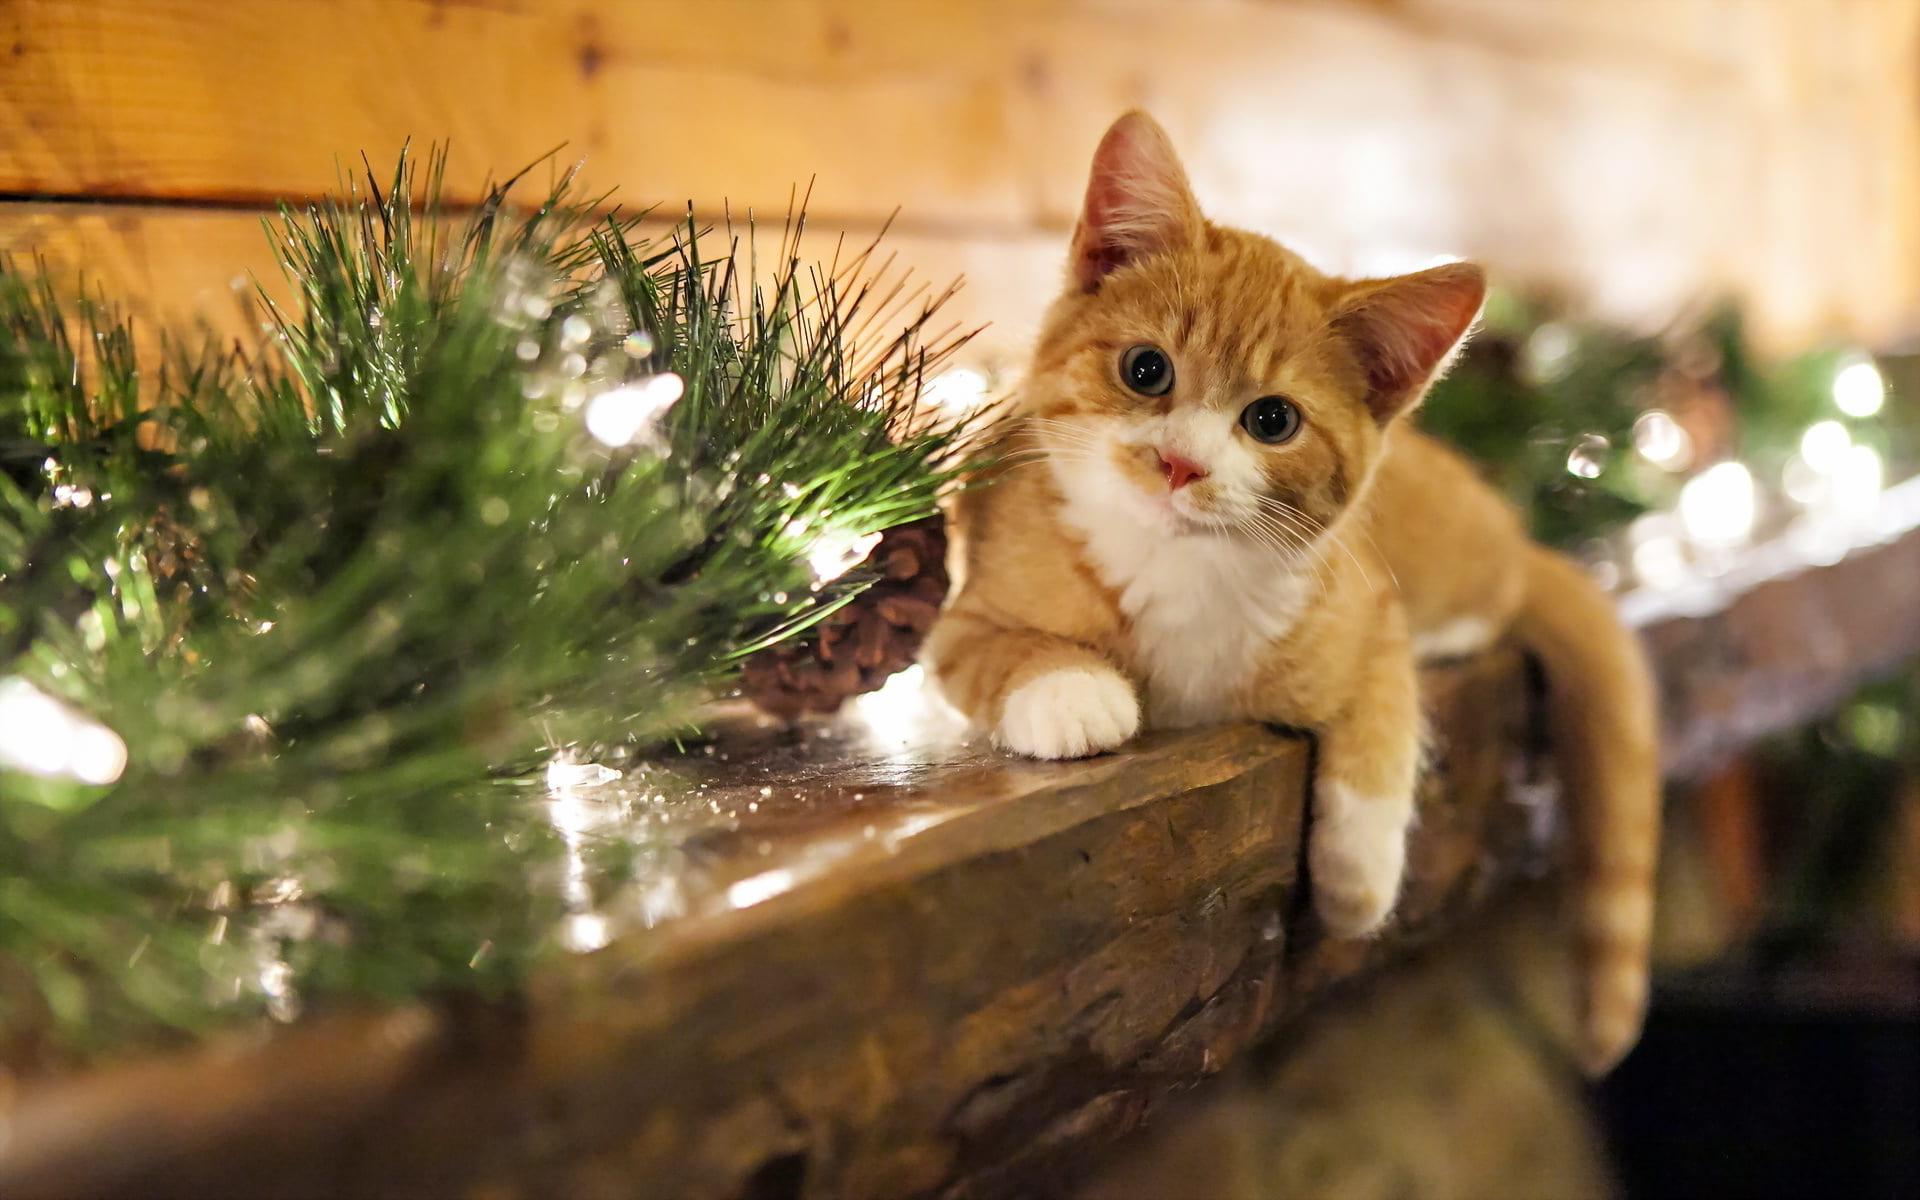 Meowy Catsmas! - Purrfect Love